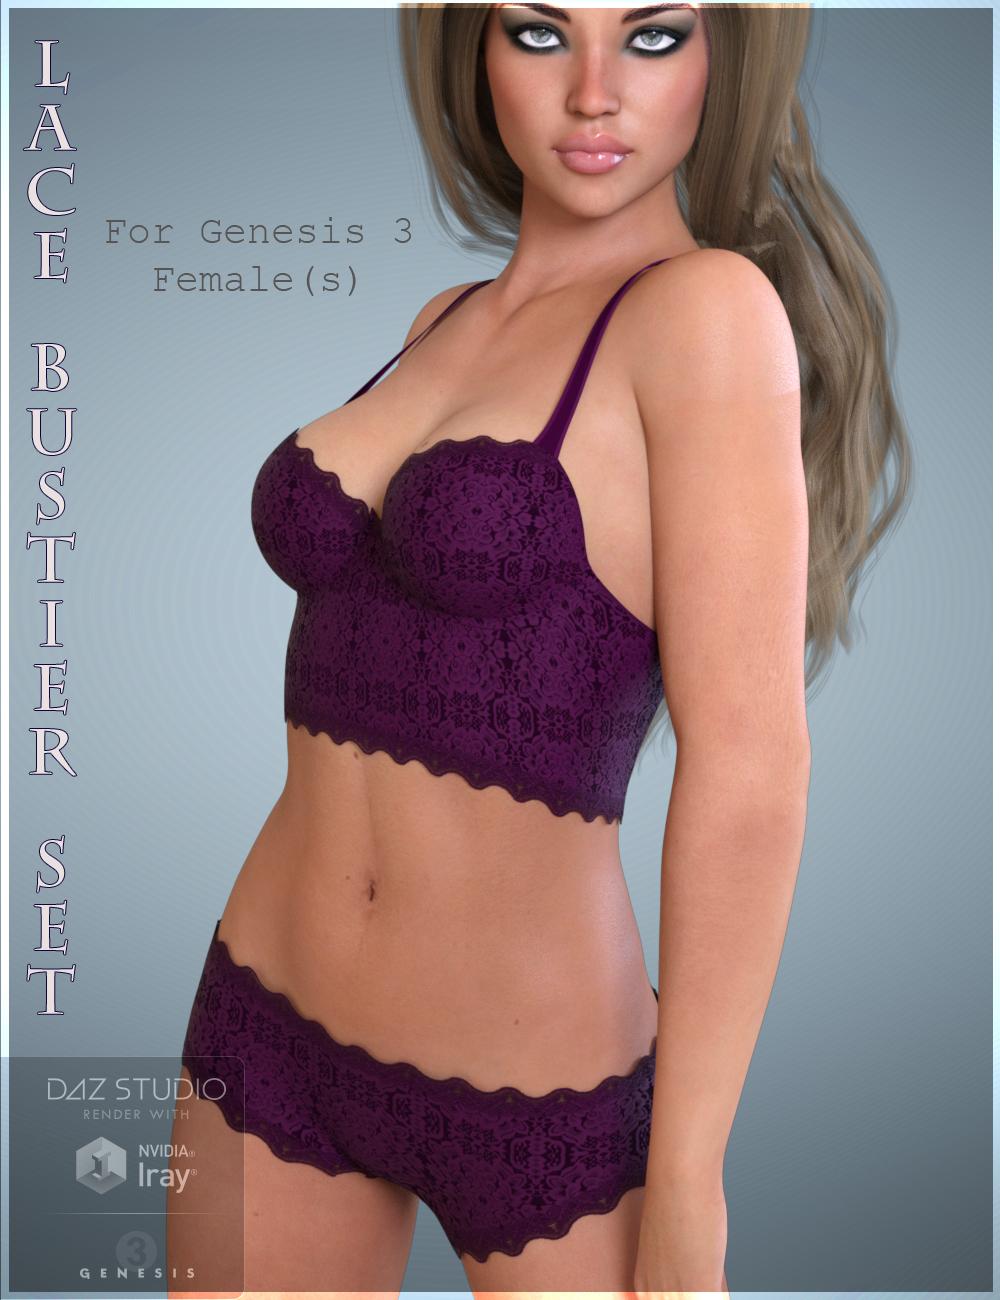 Lace Bustier Set for Genesis 3 Female(s) by: Nikisatez, 3D Models by Daz 3D